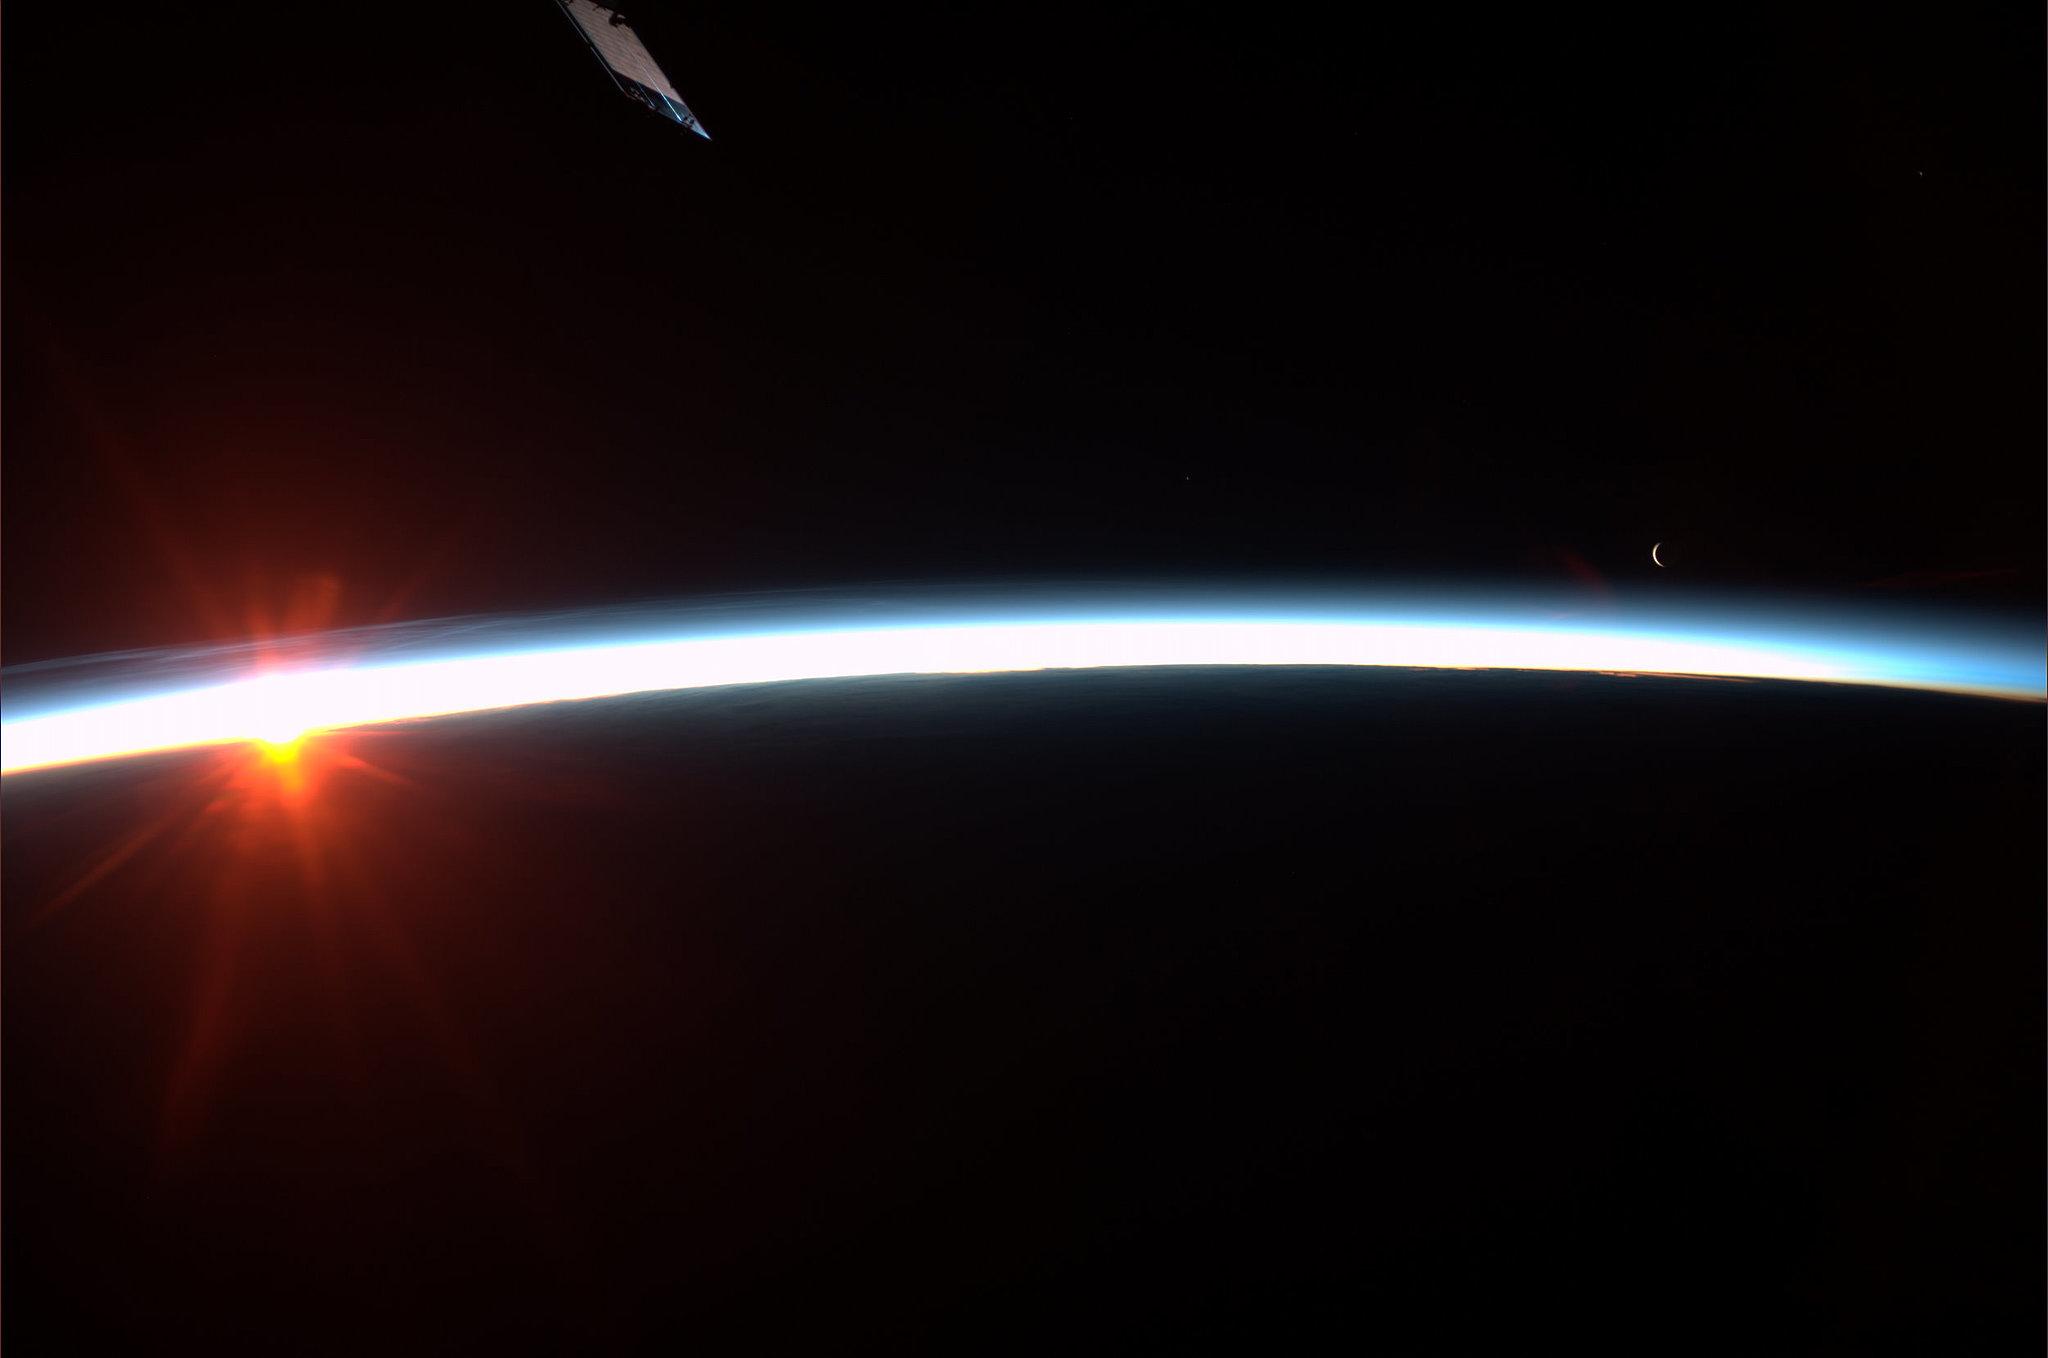 """Sunrise and moonrise. Taken August 4, 2013. KN from space."" Source: Pinterest user Karen Nyberg"